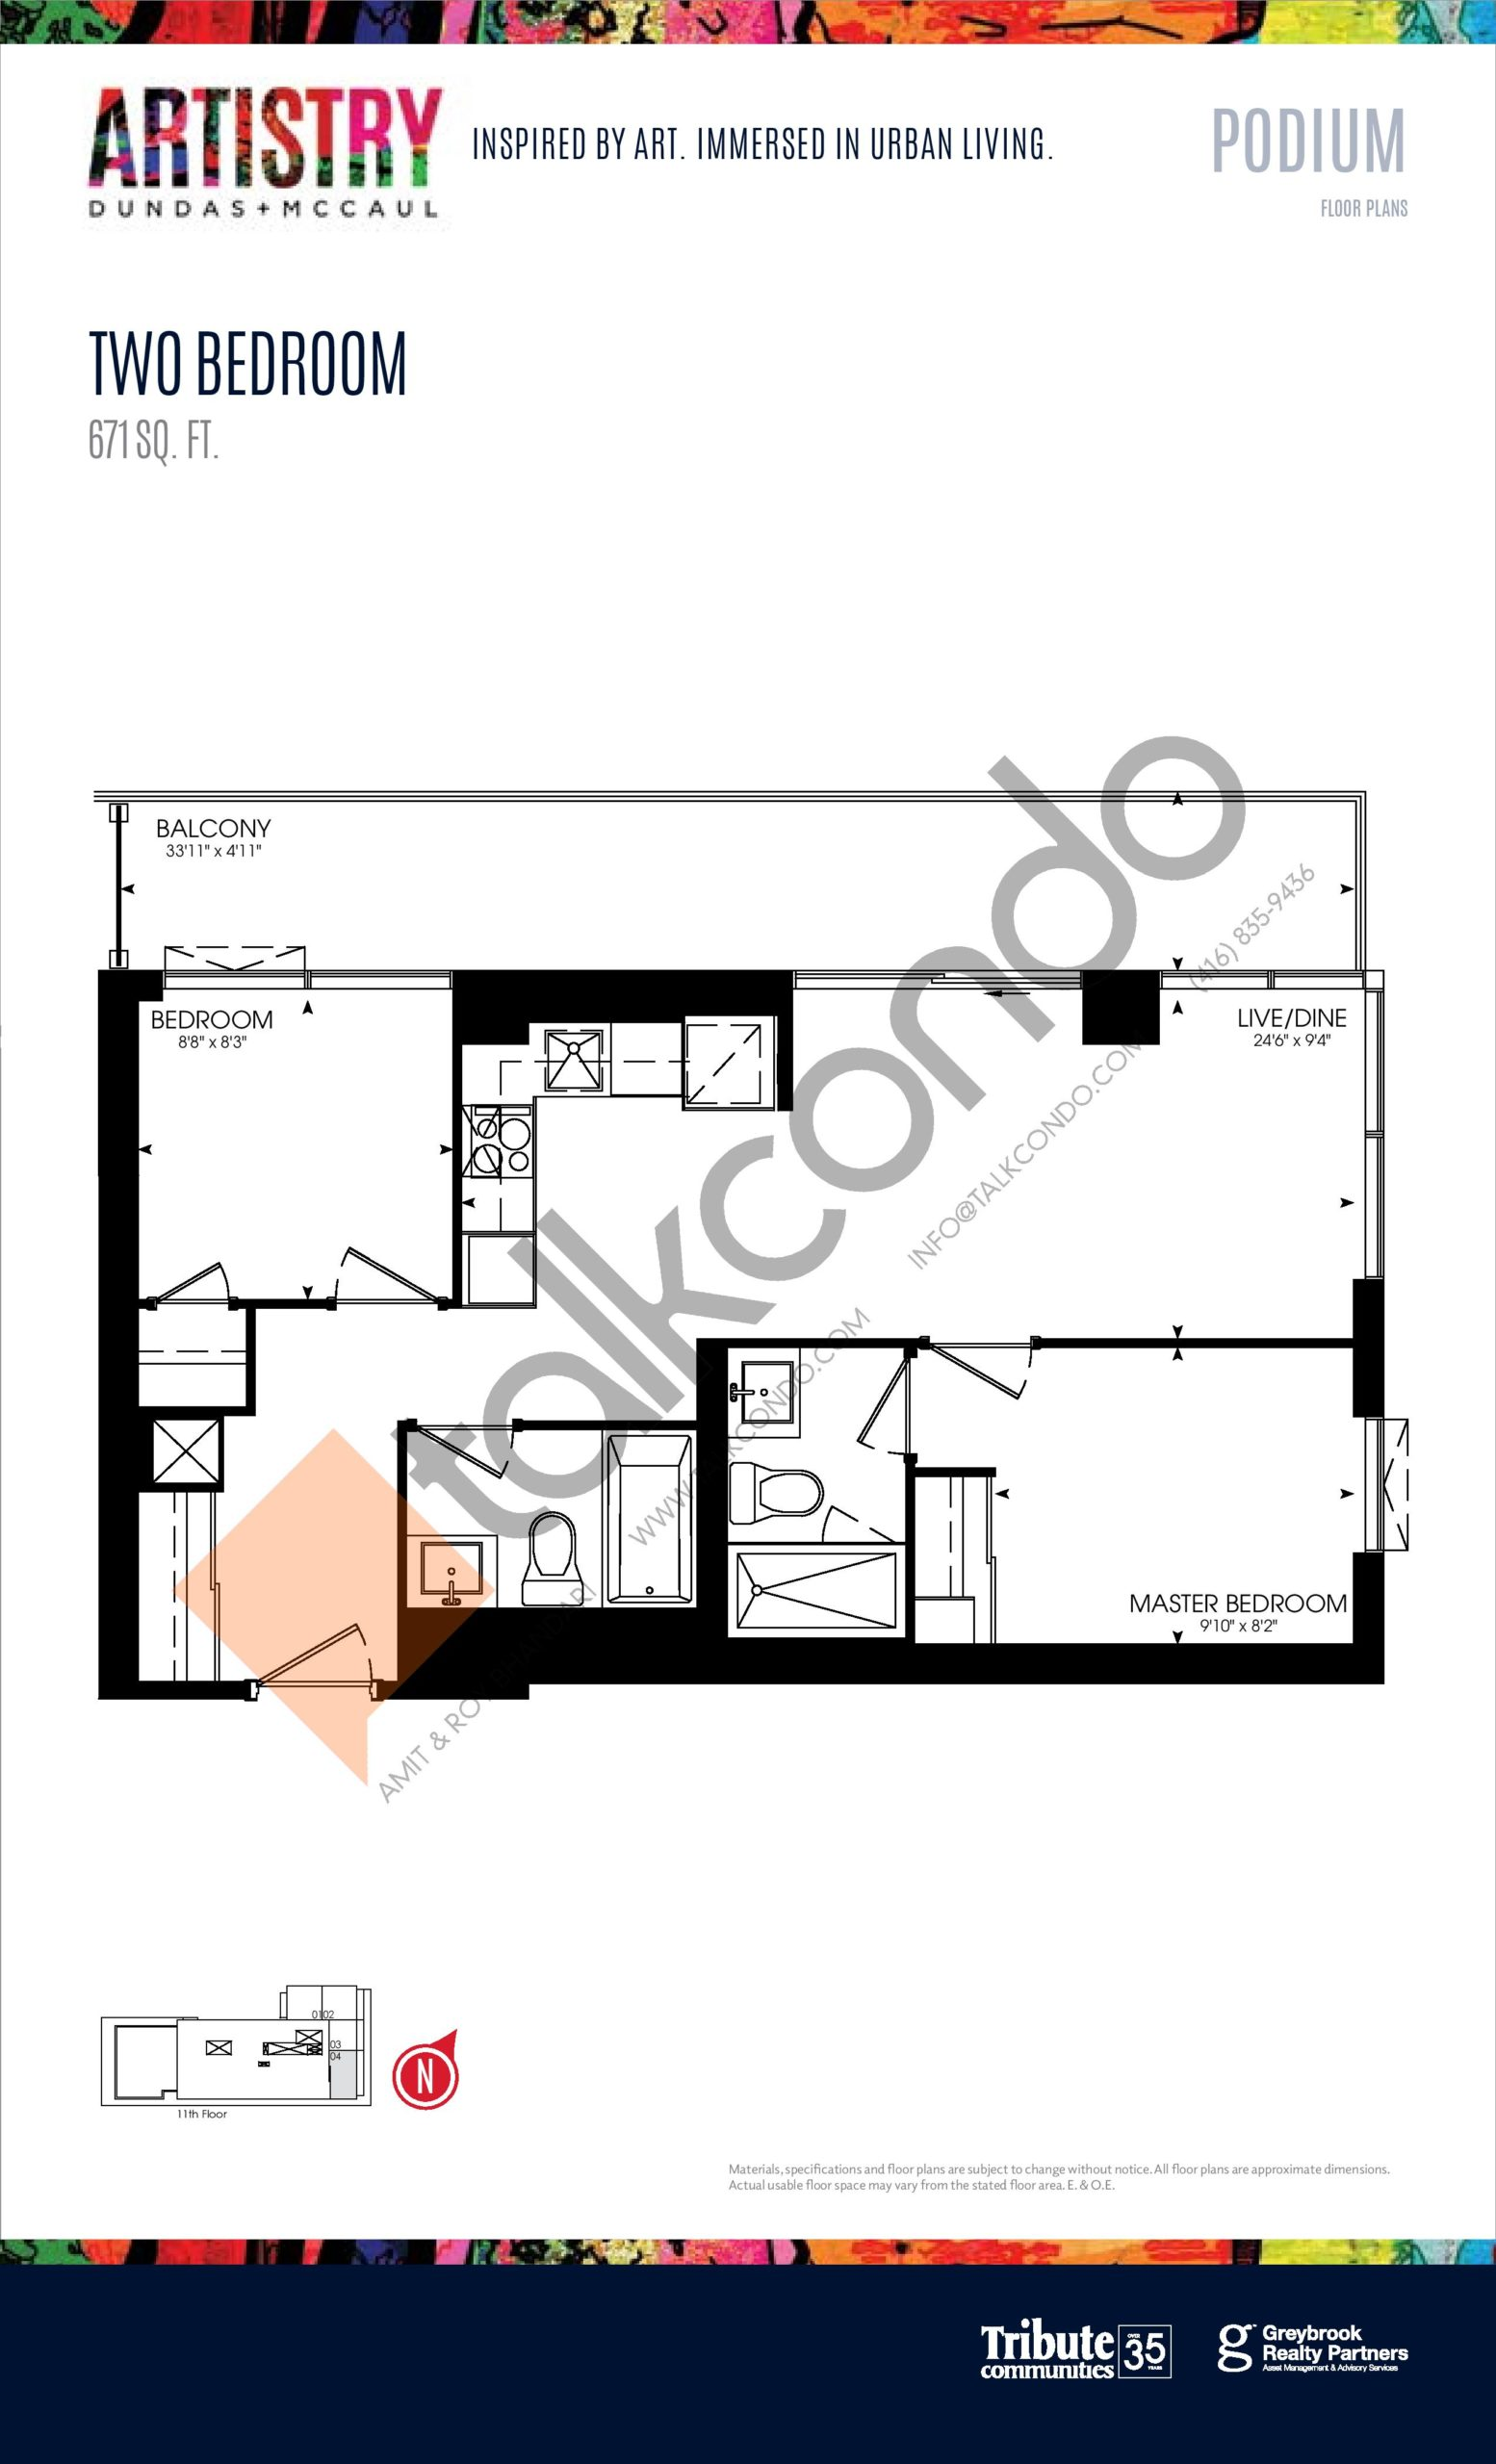 671 sq. ft. - Podium Floor Plan at Artistry Condos - 671 sq.ft